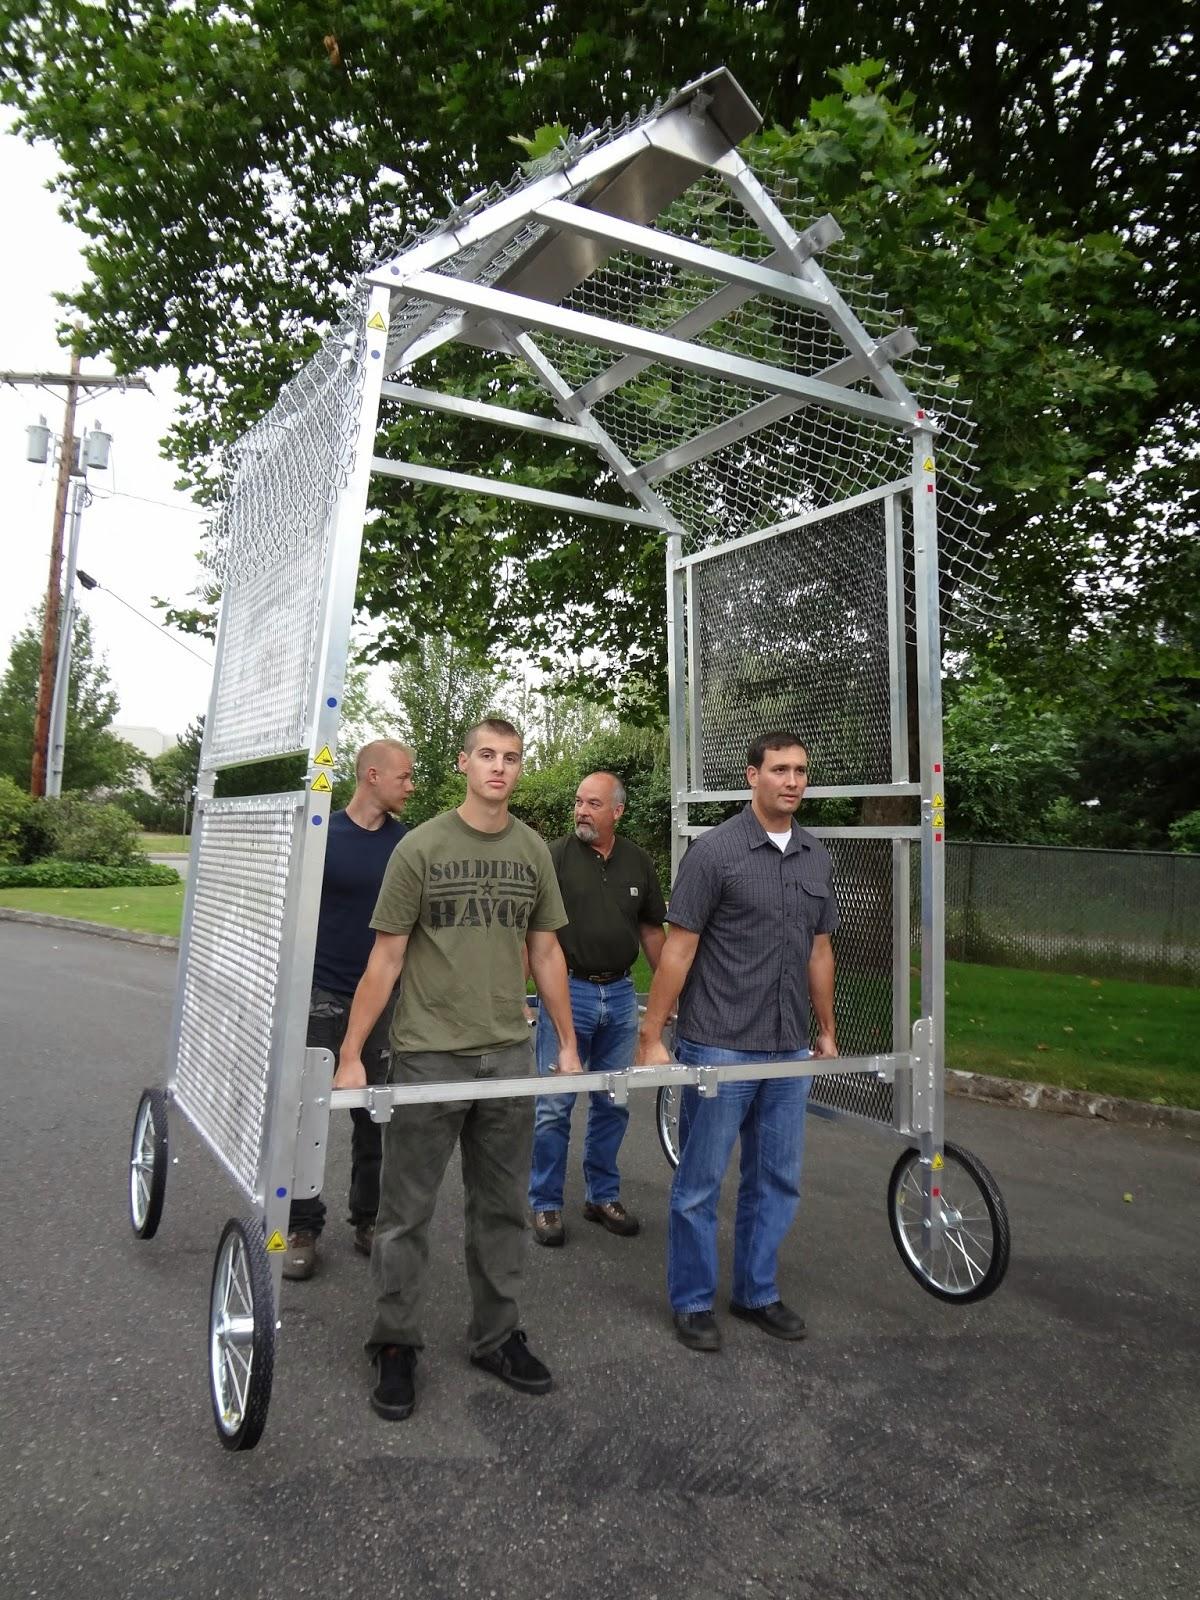 Kiln safety inspection cage